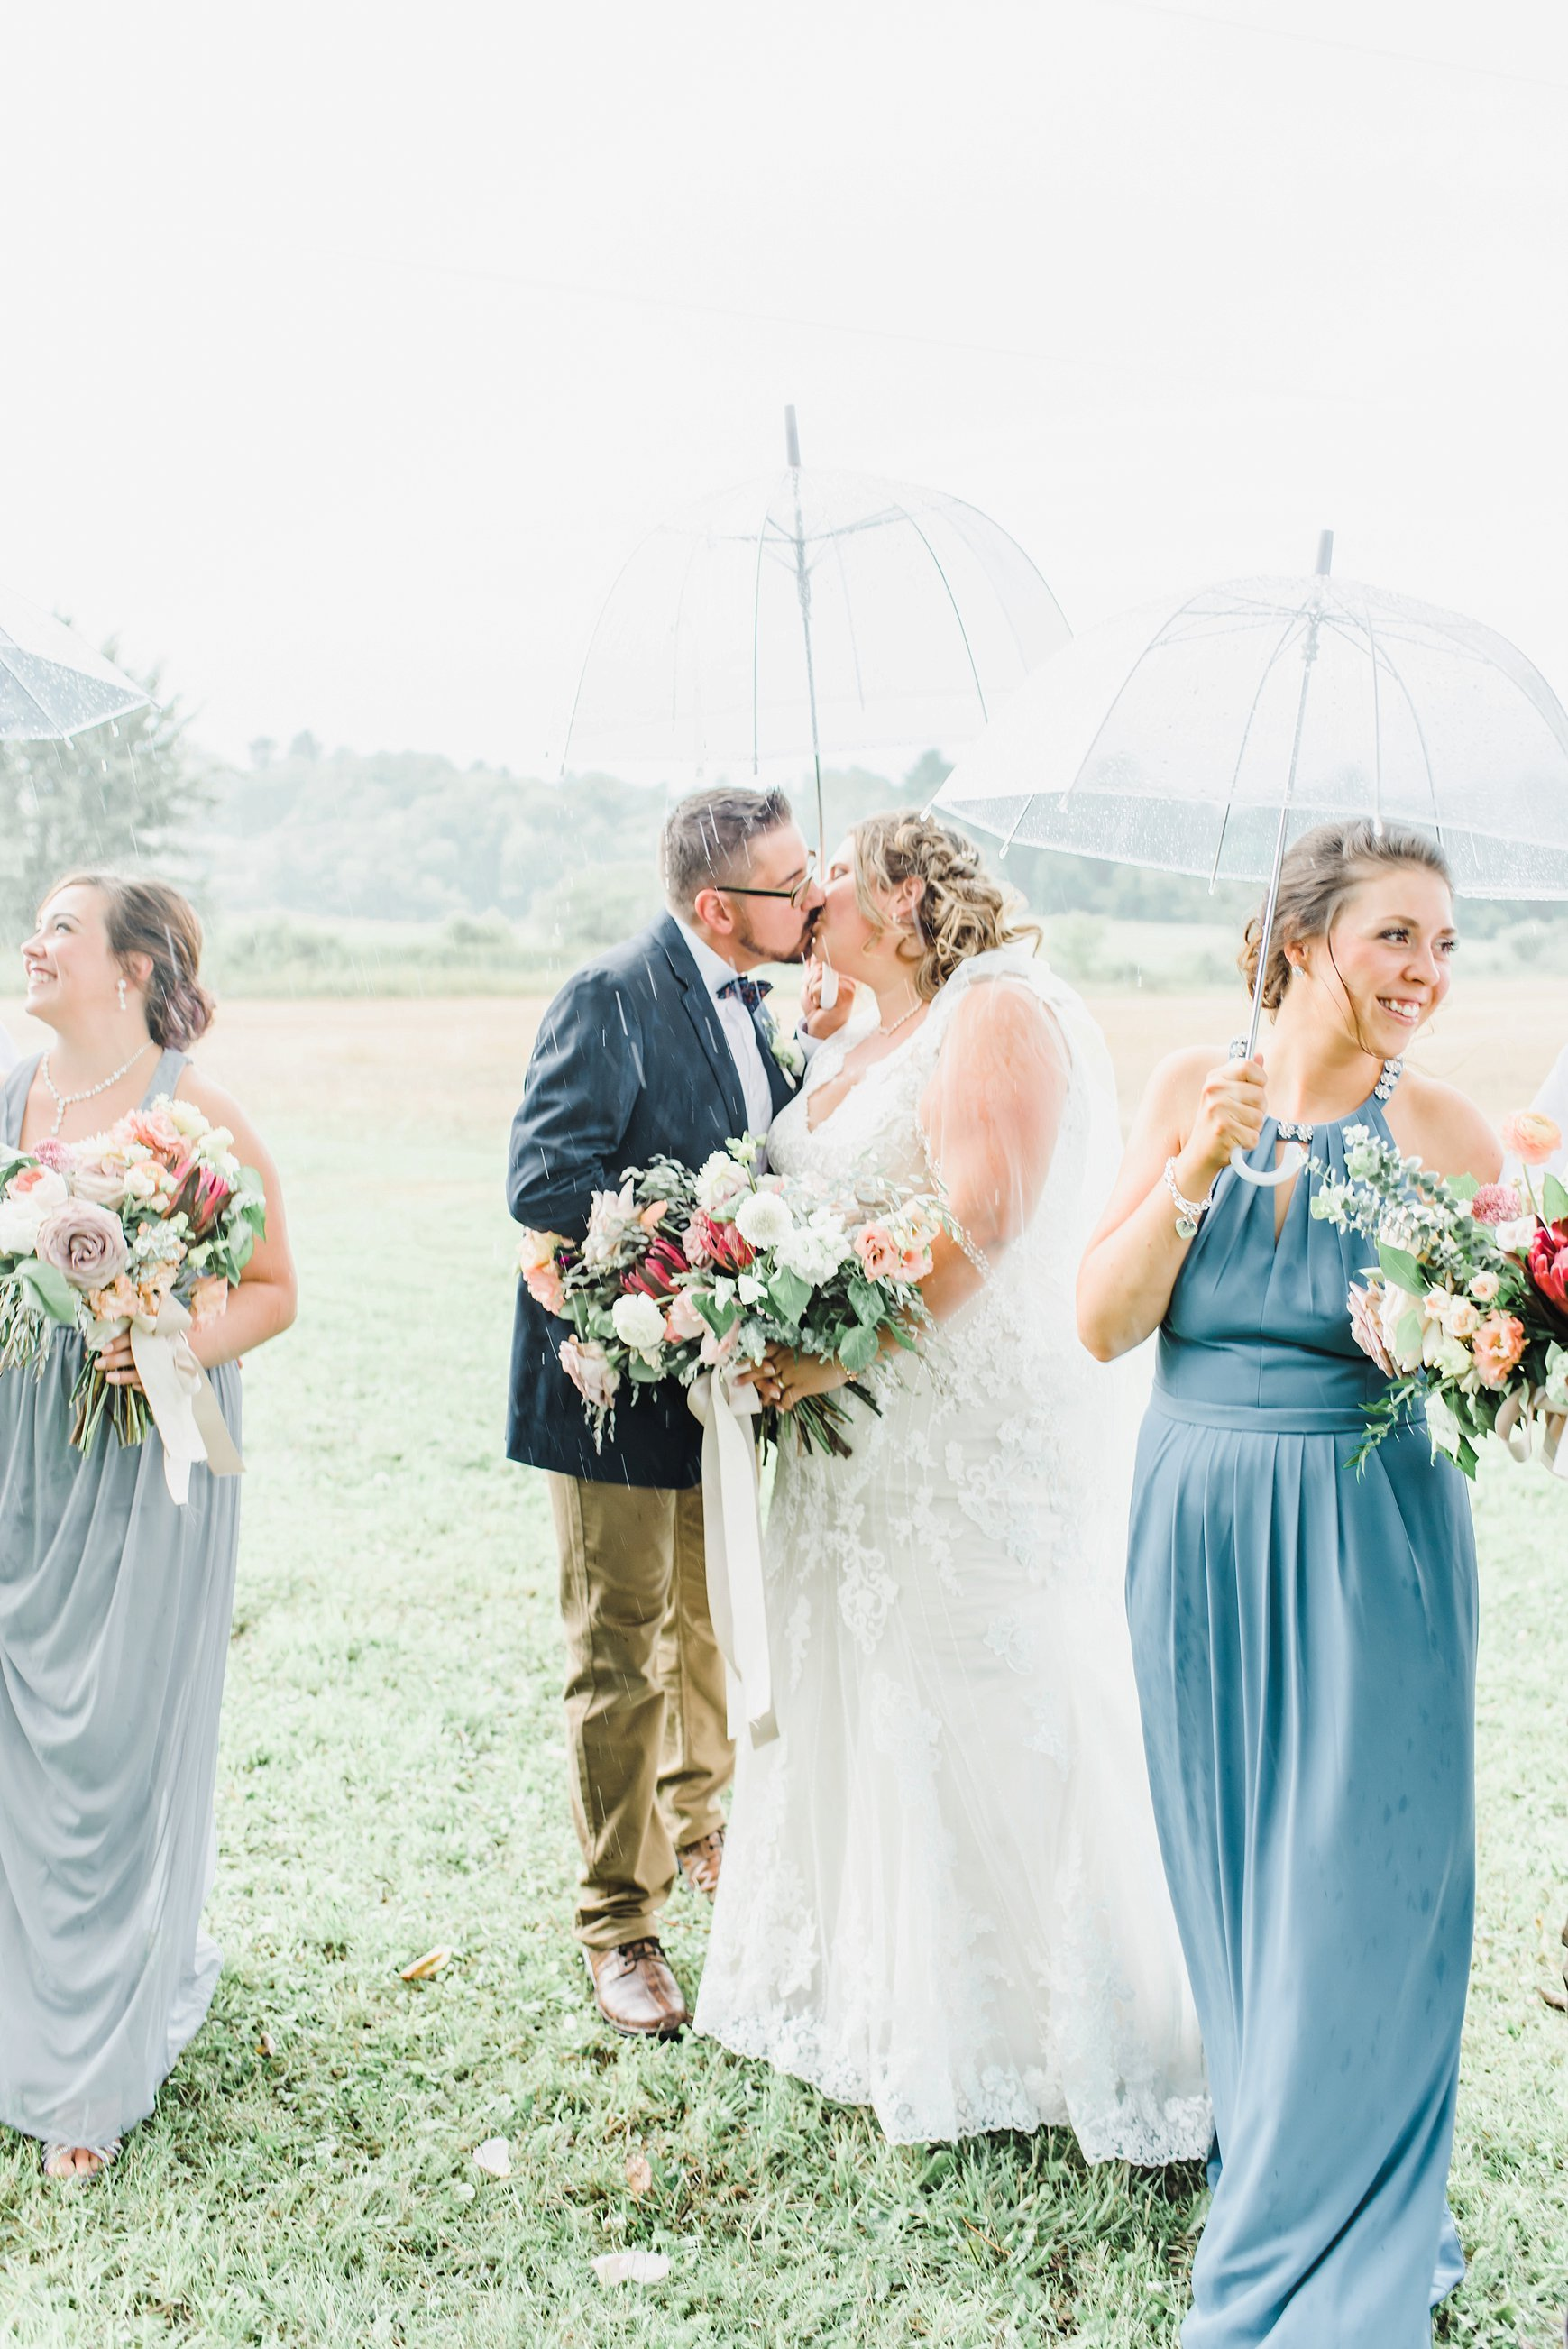 light airy indie fine art ottawa wedding photographer | Ali and Batoul Photography_0401.jpg